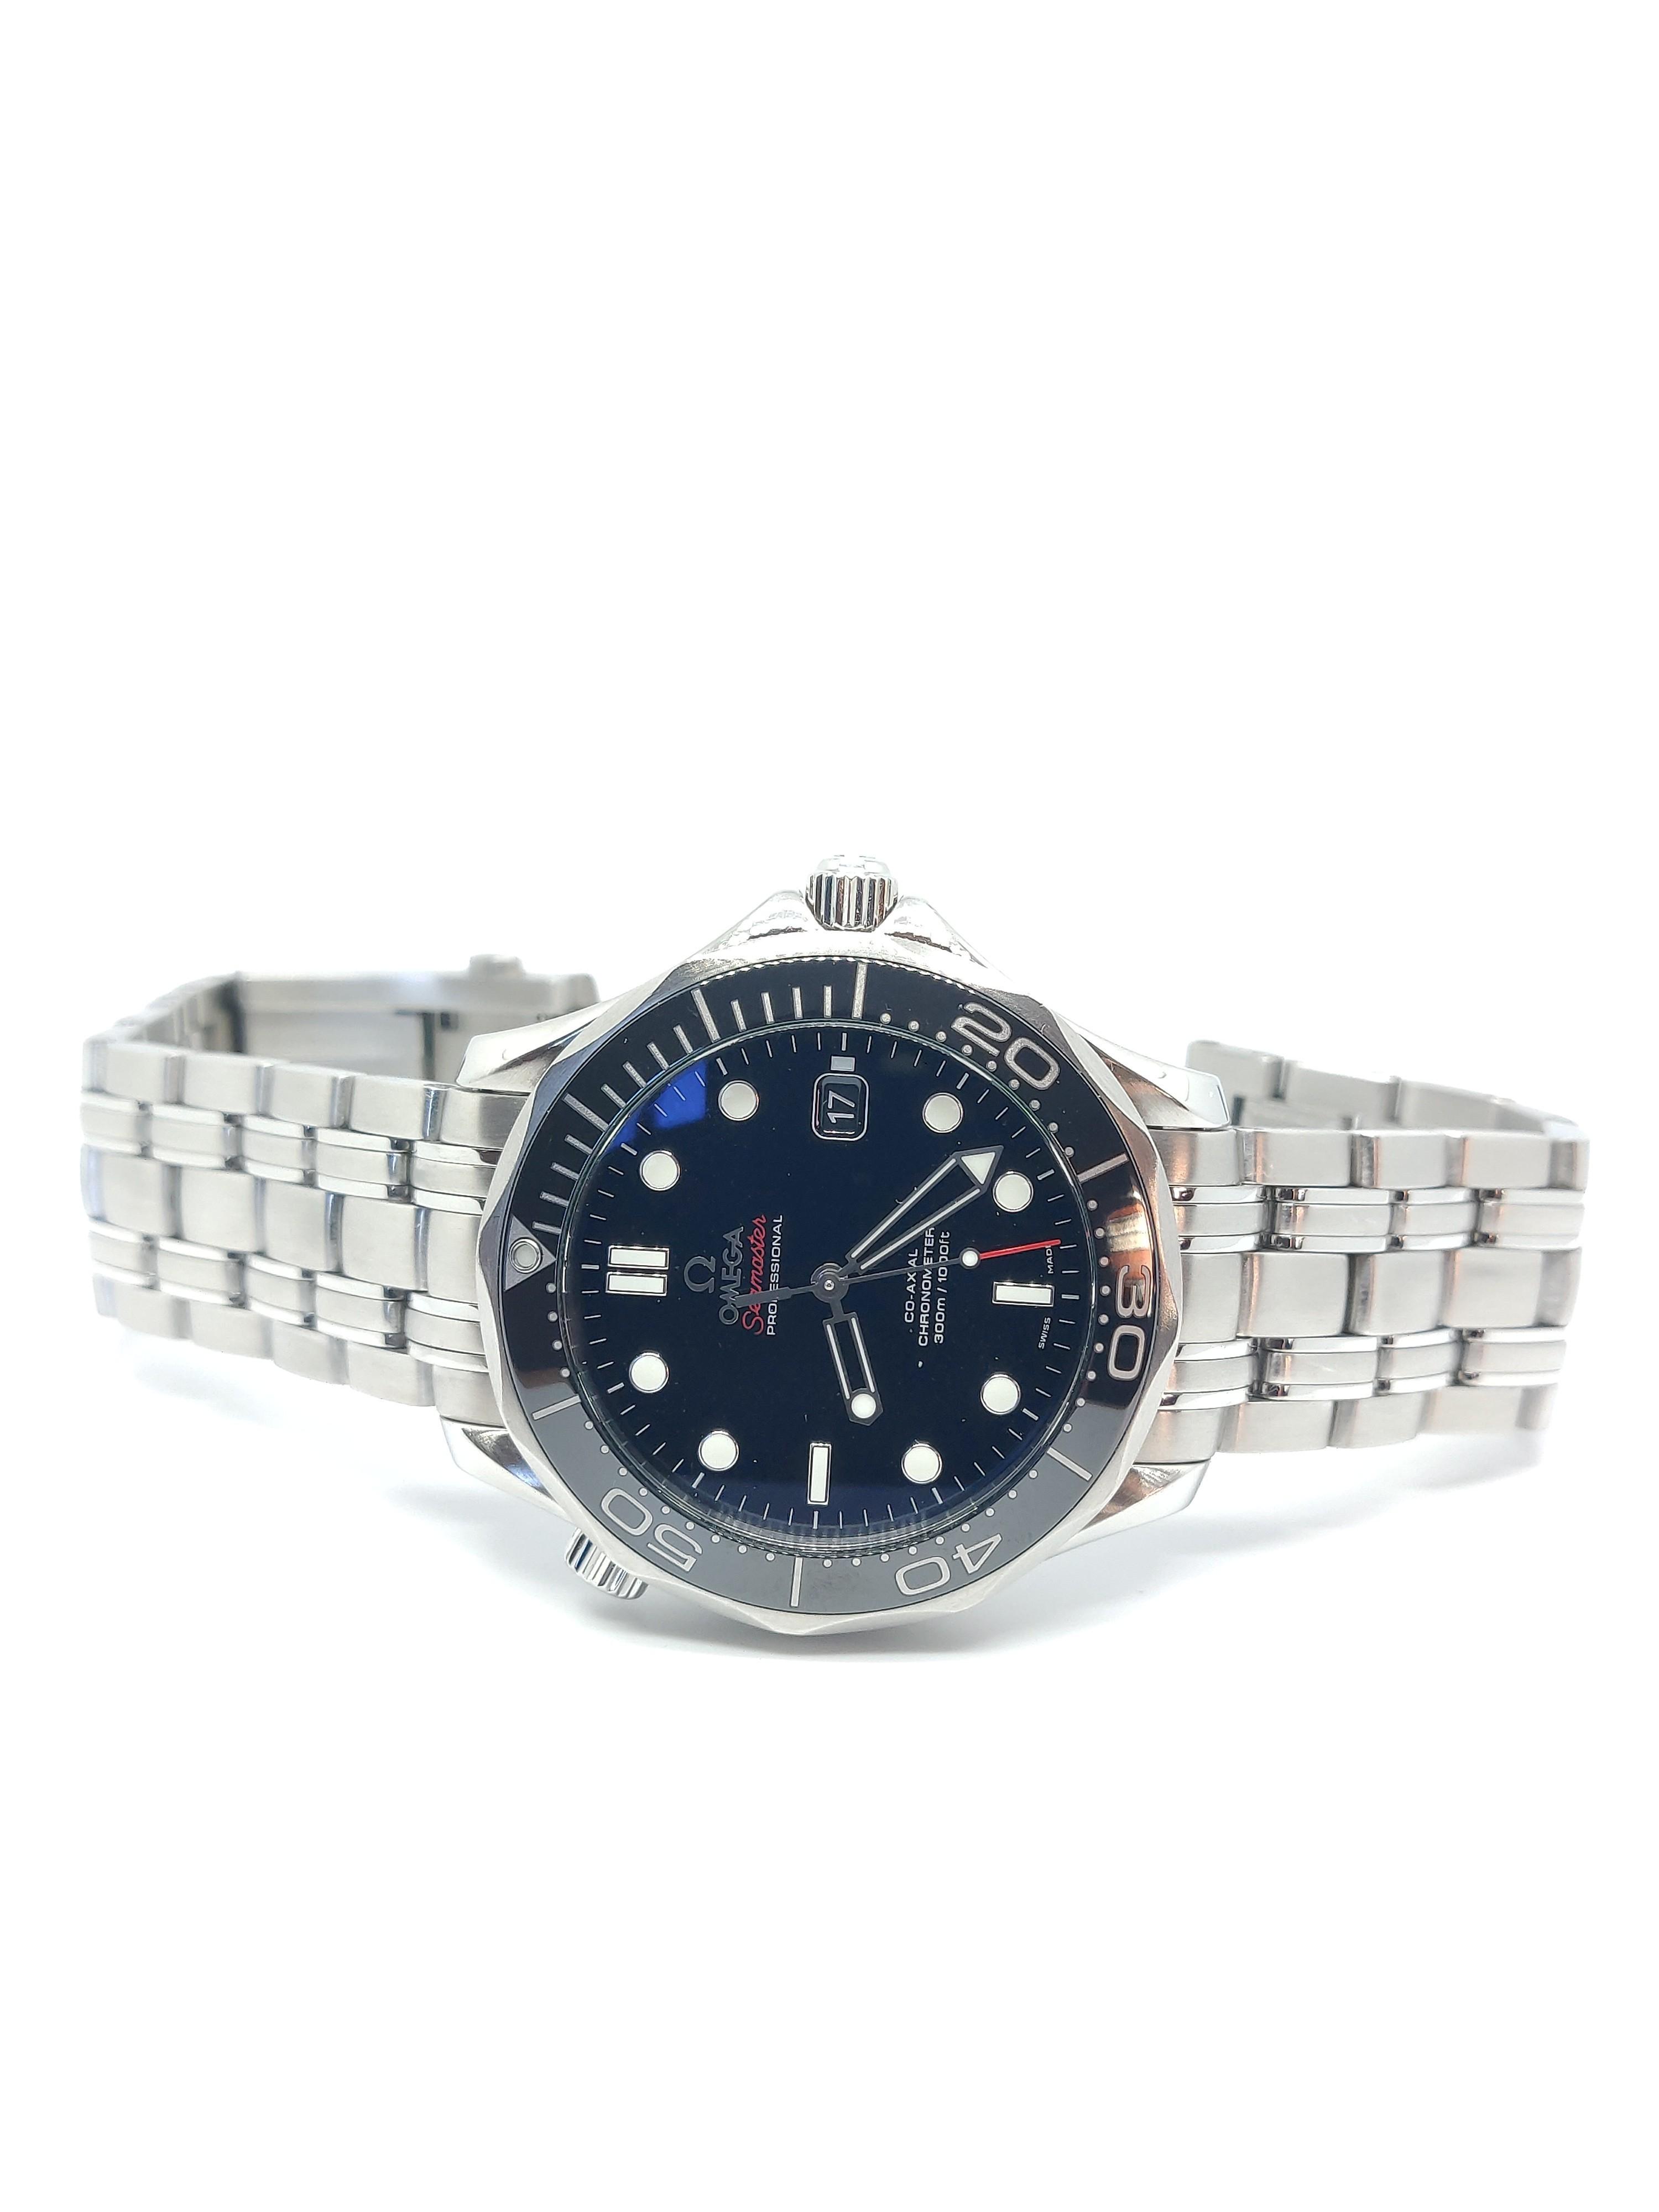 2012 Gents Omega Seamaster Professional